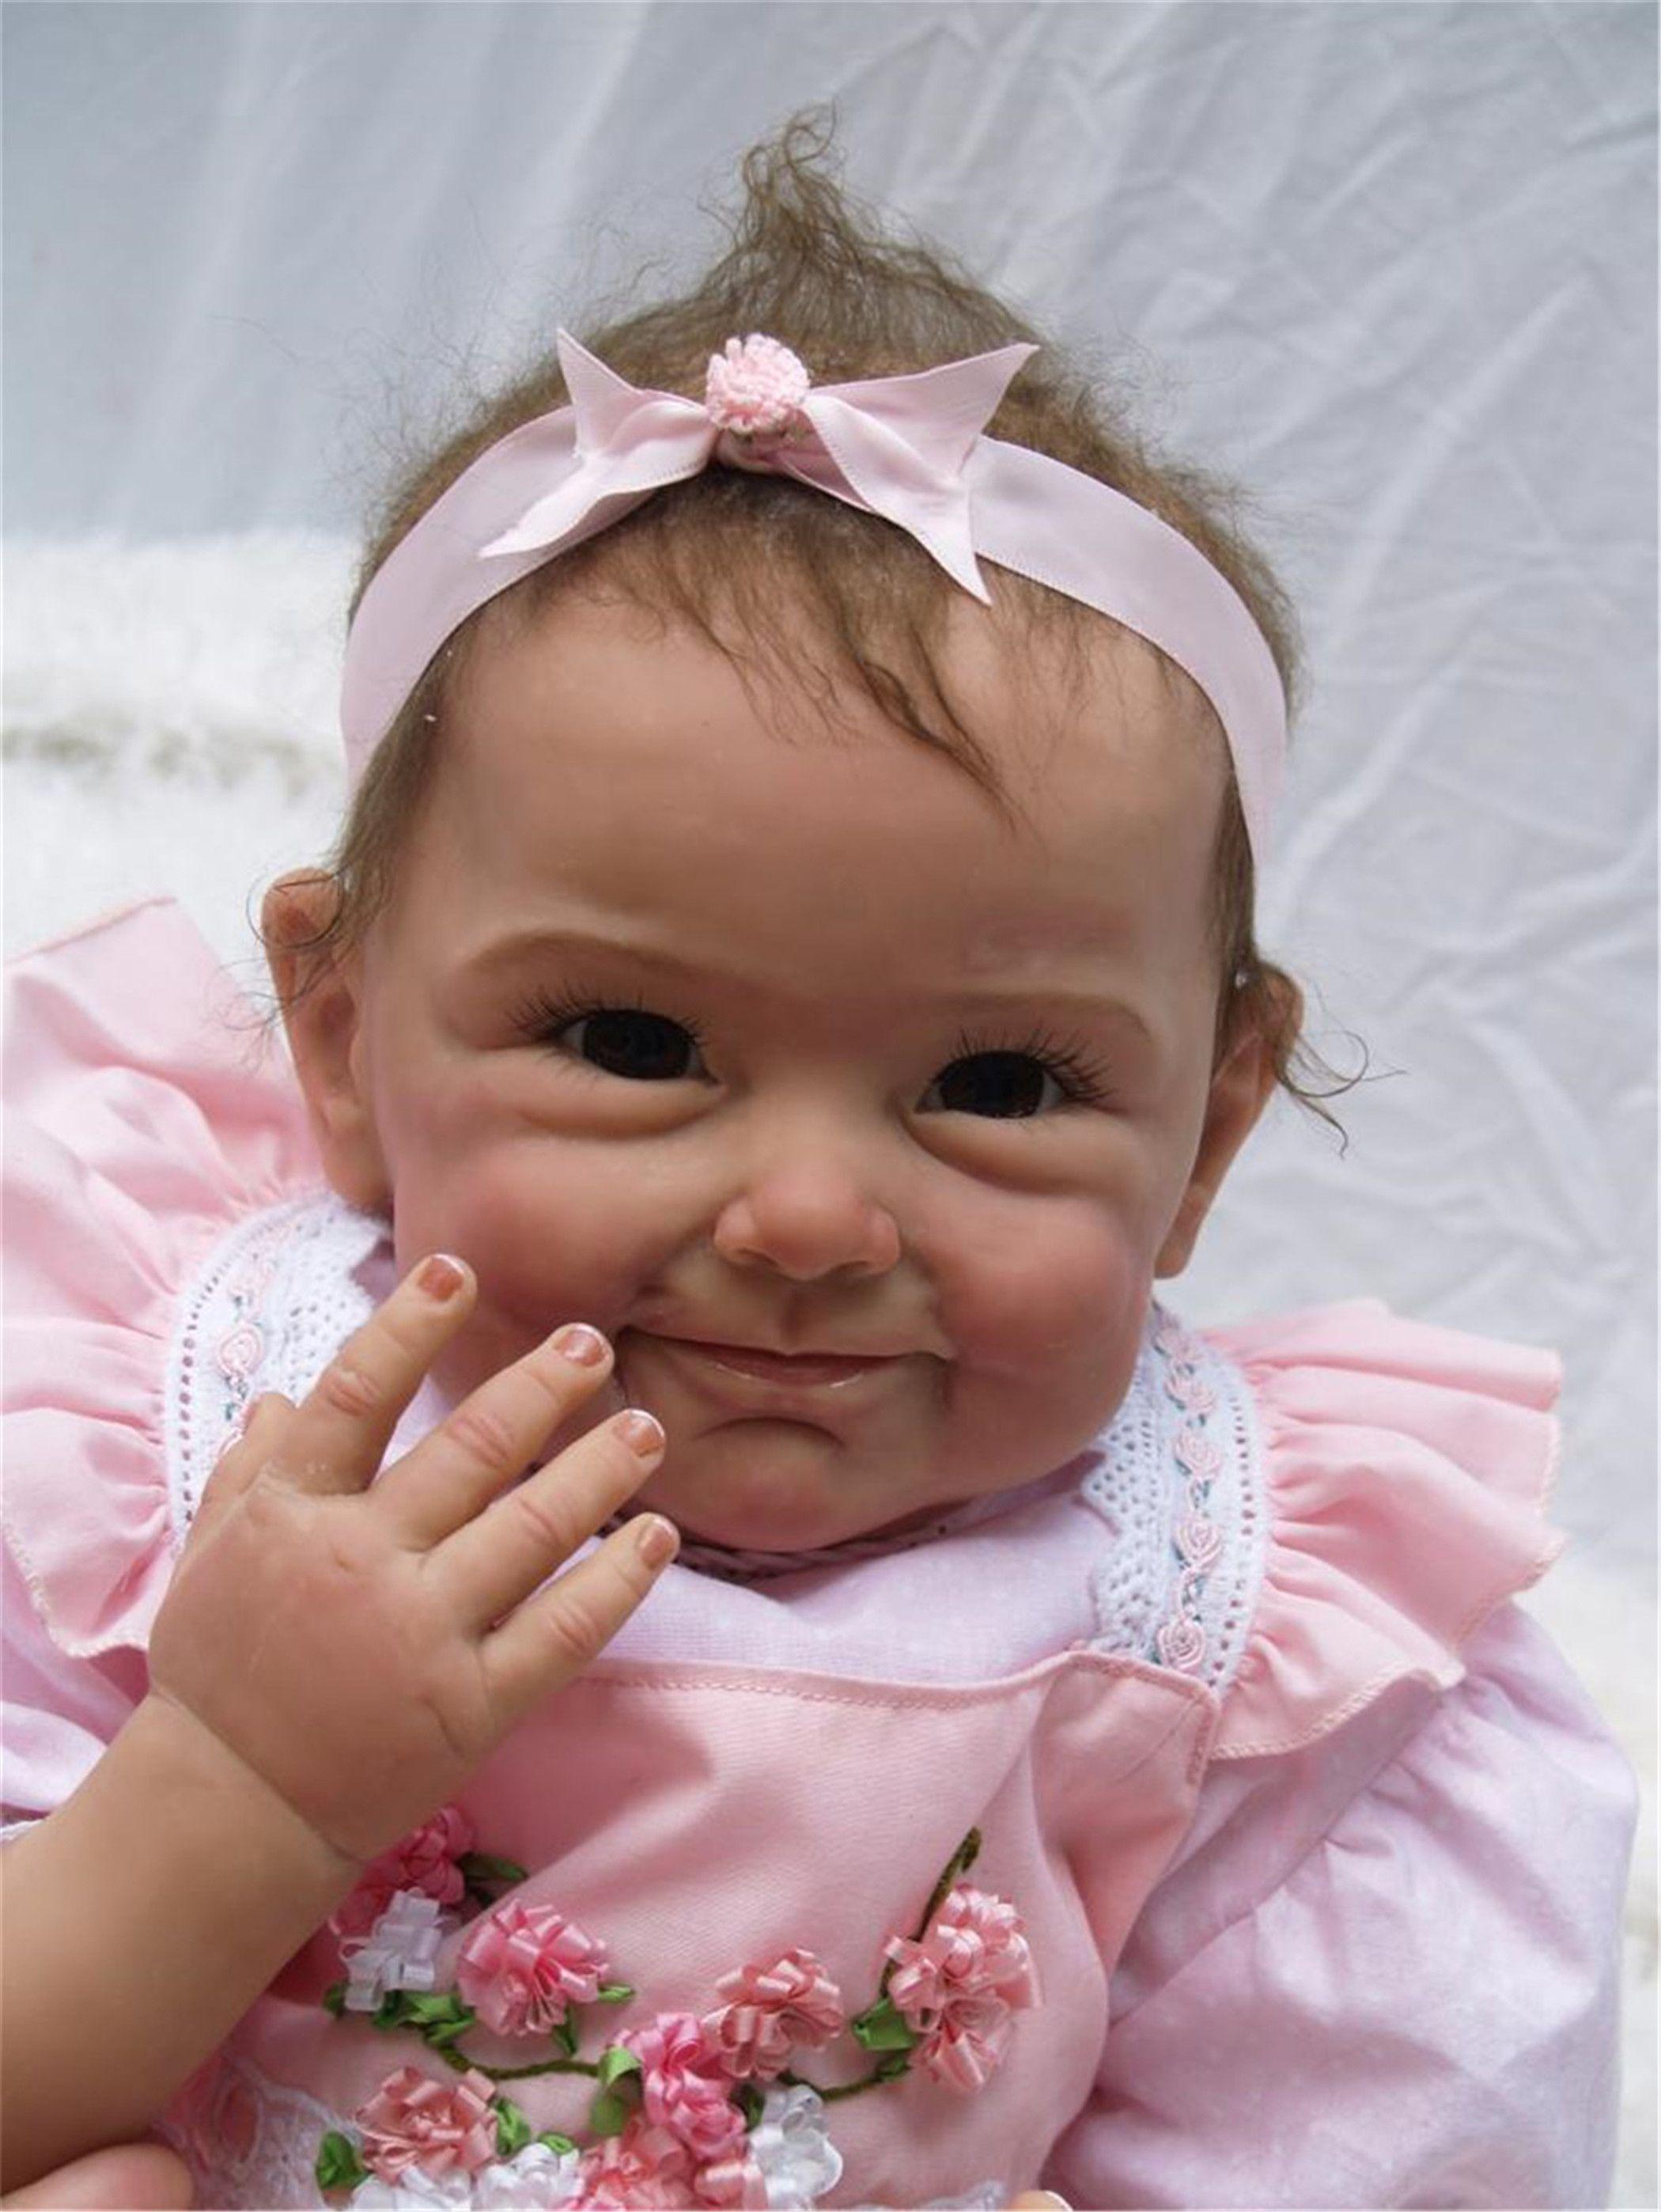 Toys Cheap reborn dolls, Reborn babies, Silicone reborn